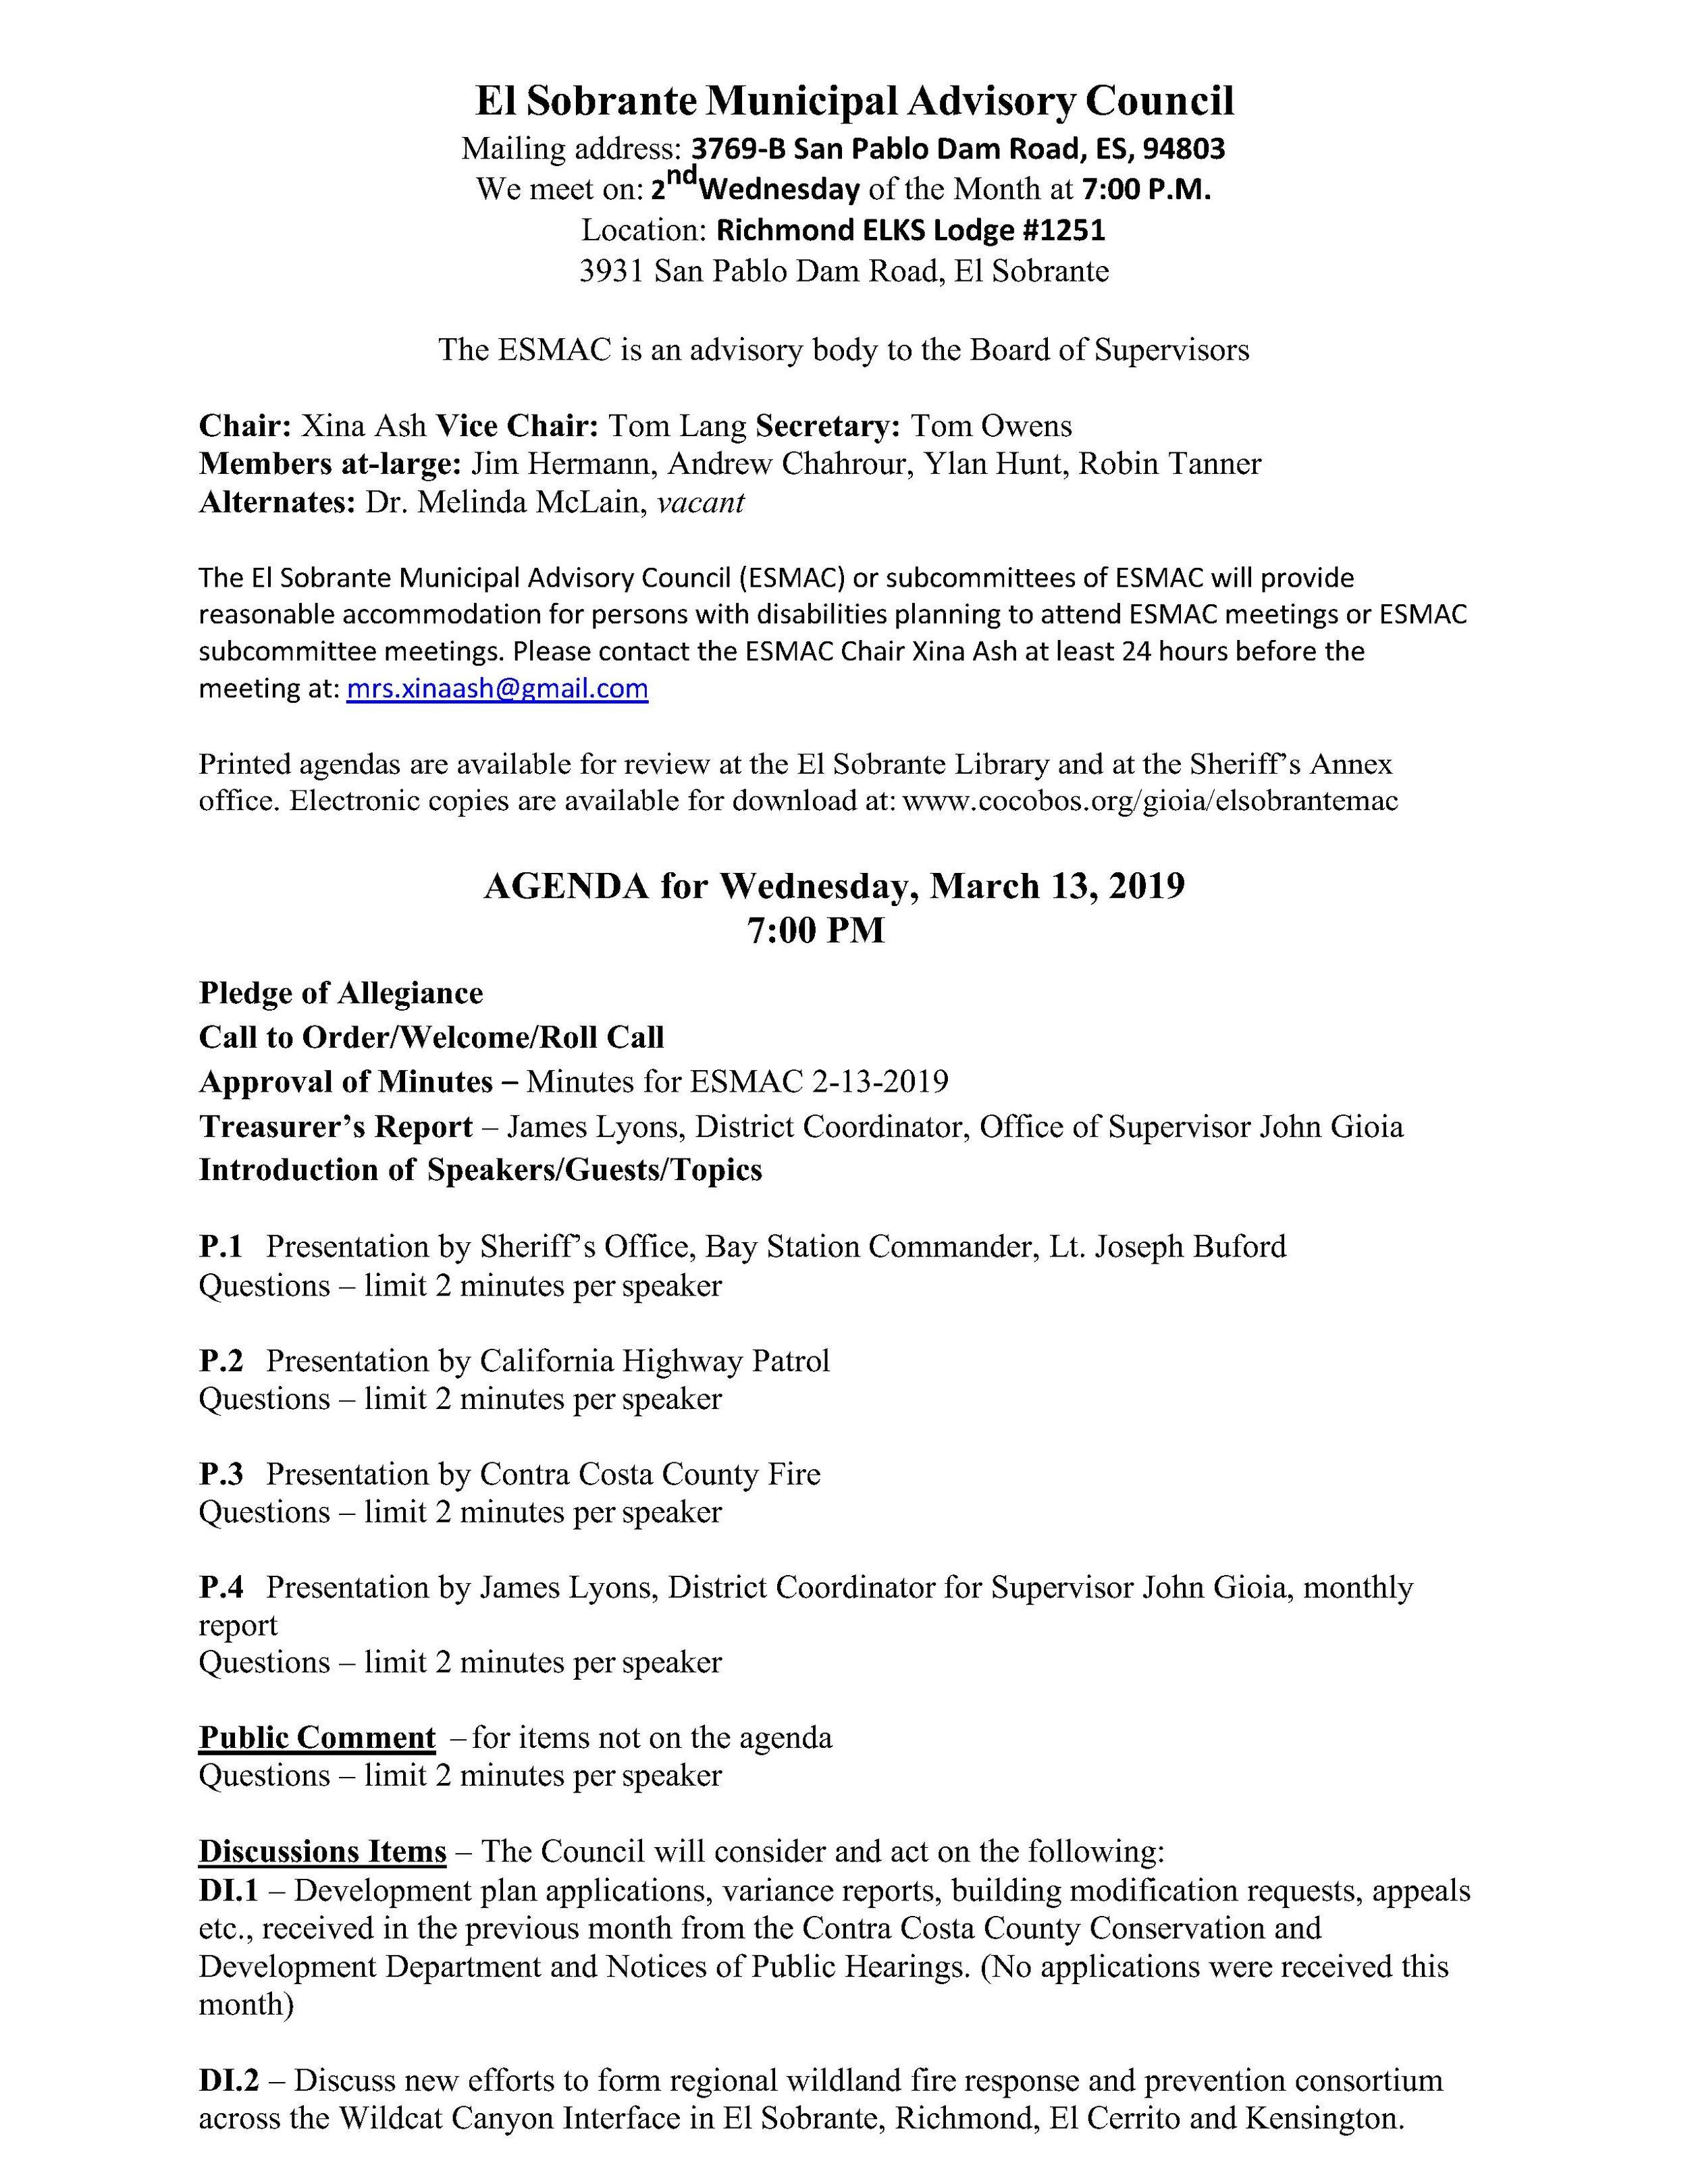 ESMAC Agenda 3.13.2019 (8 Pages)_1.jpg